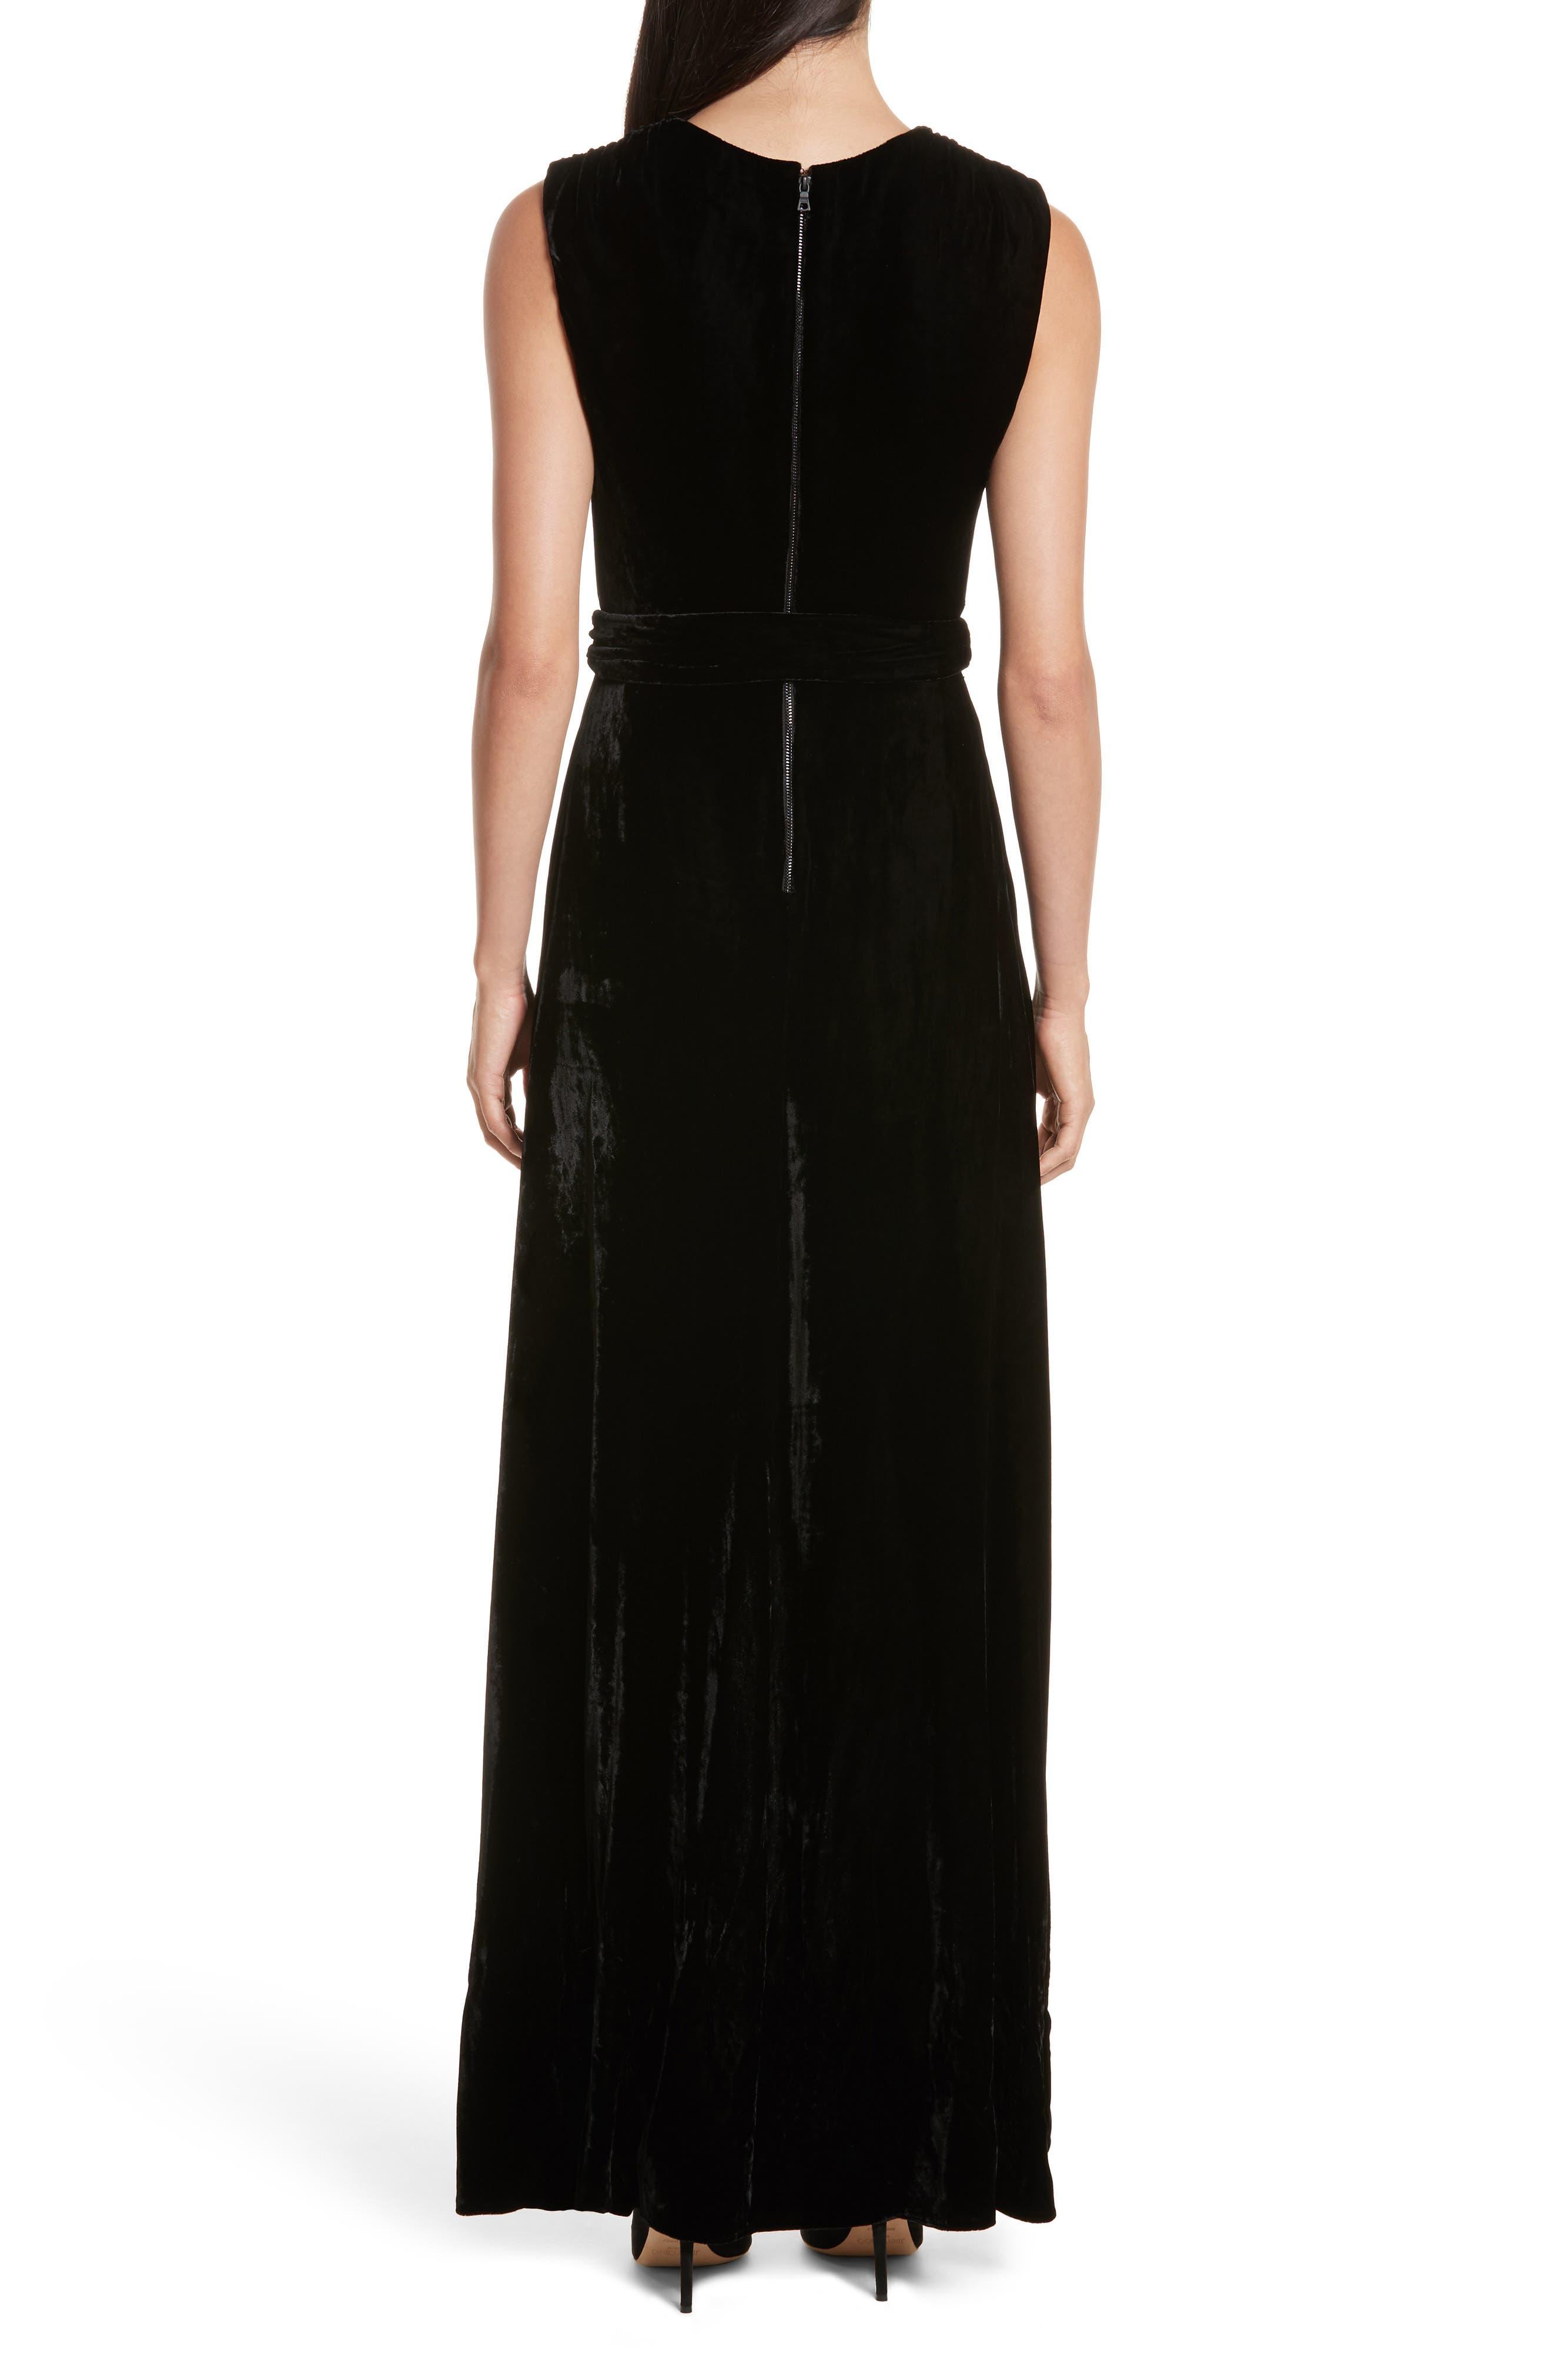 Simmons Velvet Wrap Maxi Dress,                             Alternate thumbnail 2, color,                             001